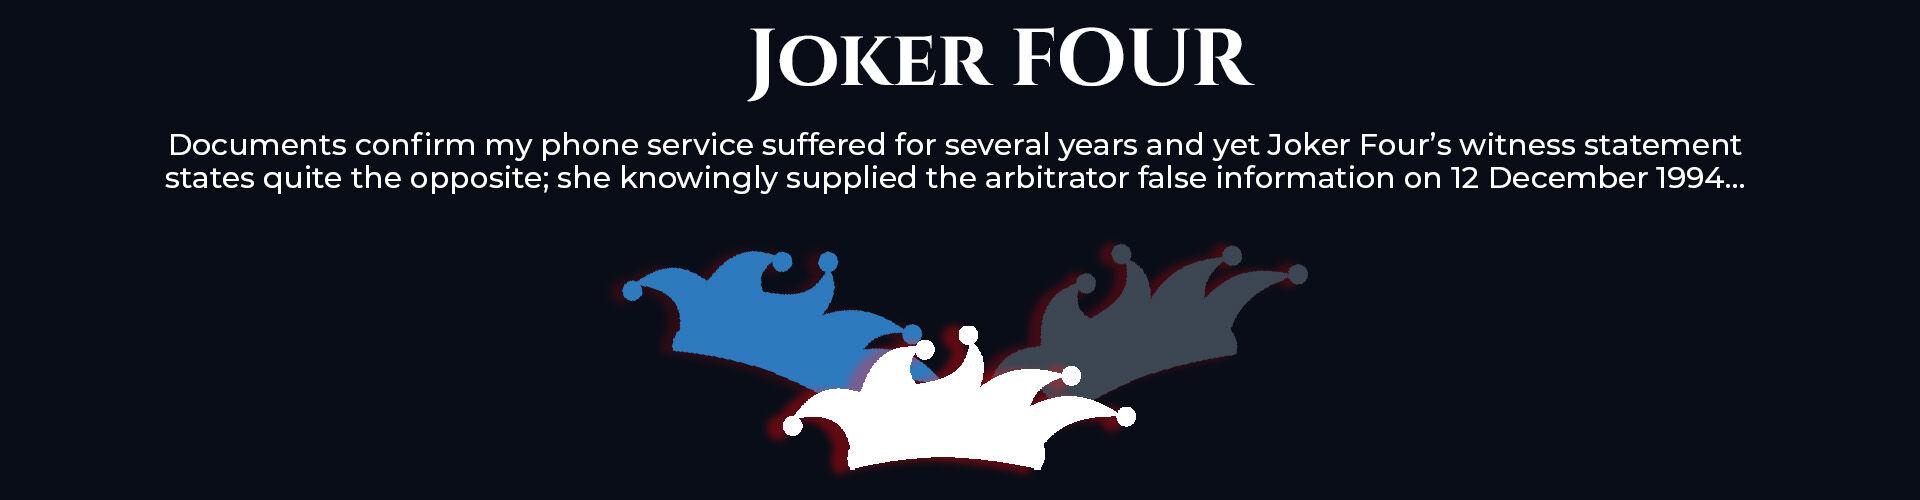 Absent Justice - Joker Four